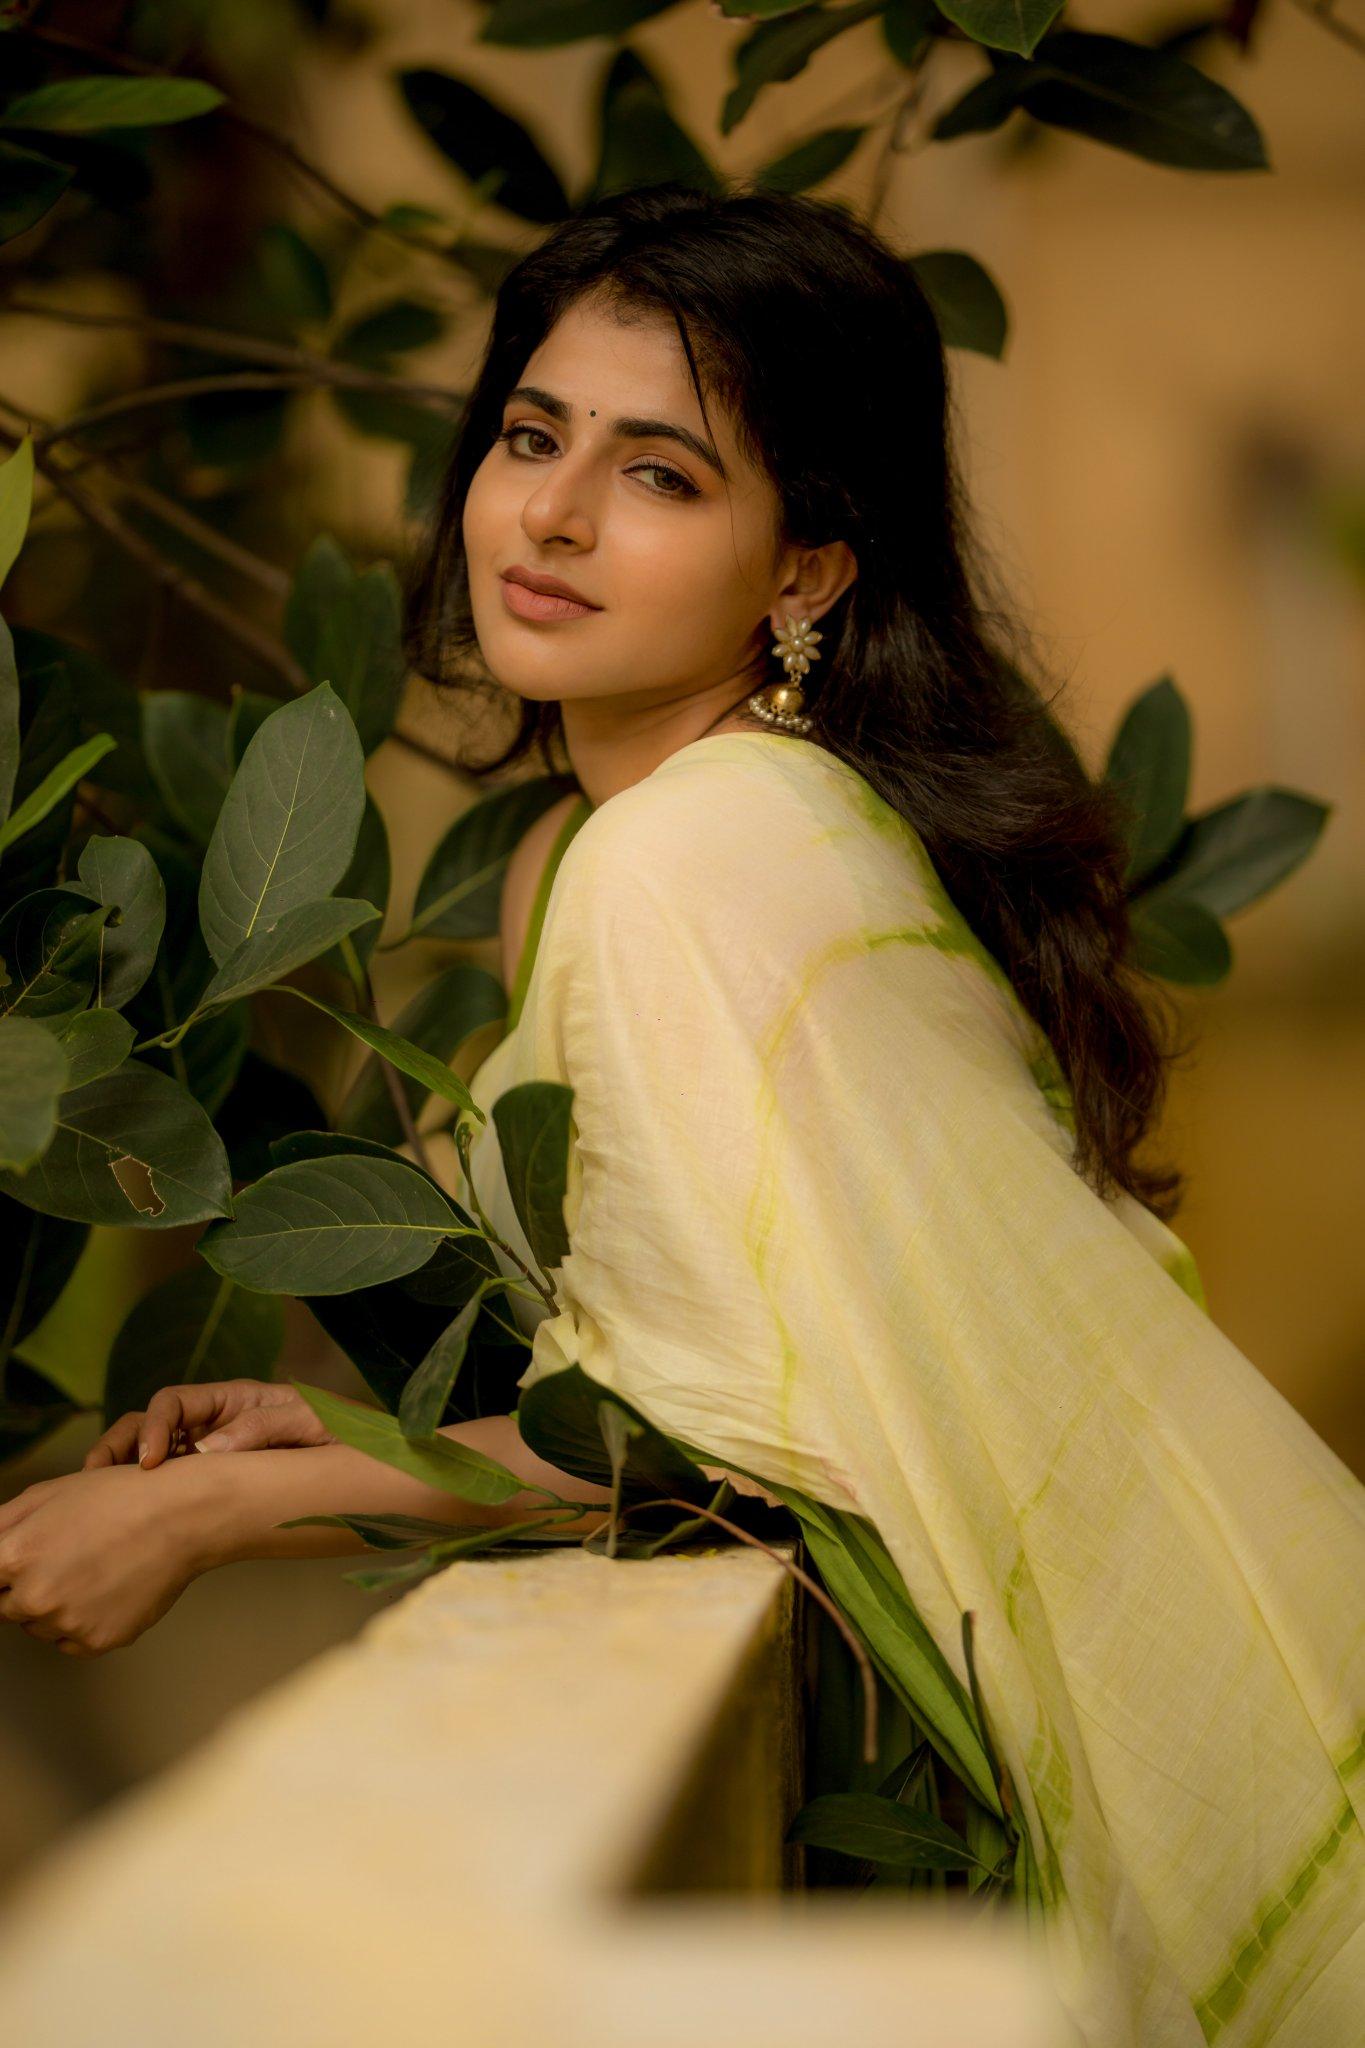 Iswarya Menon Latest Photoshoot Pictures , Iswarya Menon Latest Photoshoot 2021, Iswarya Menon Sexy Latest Photoshoot,Iswarya Menon green saree